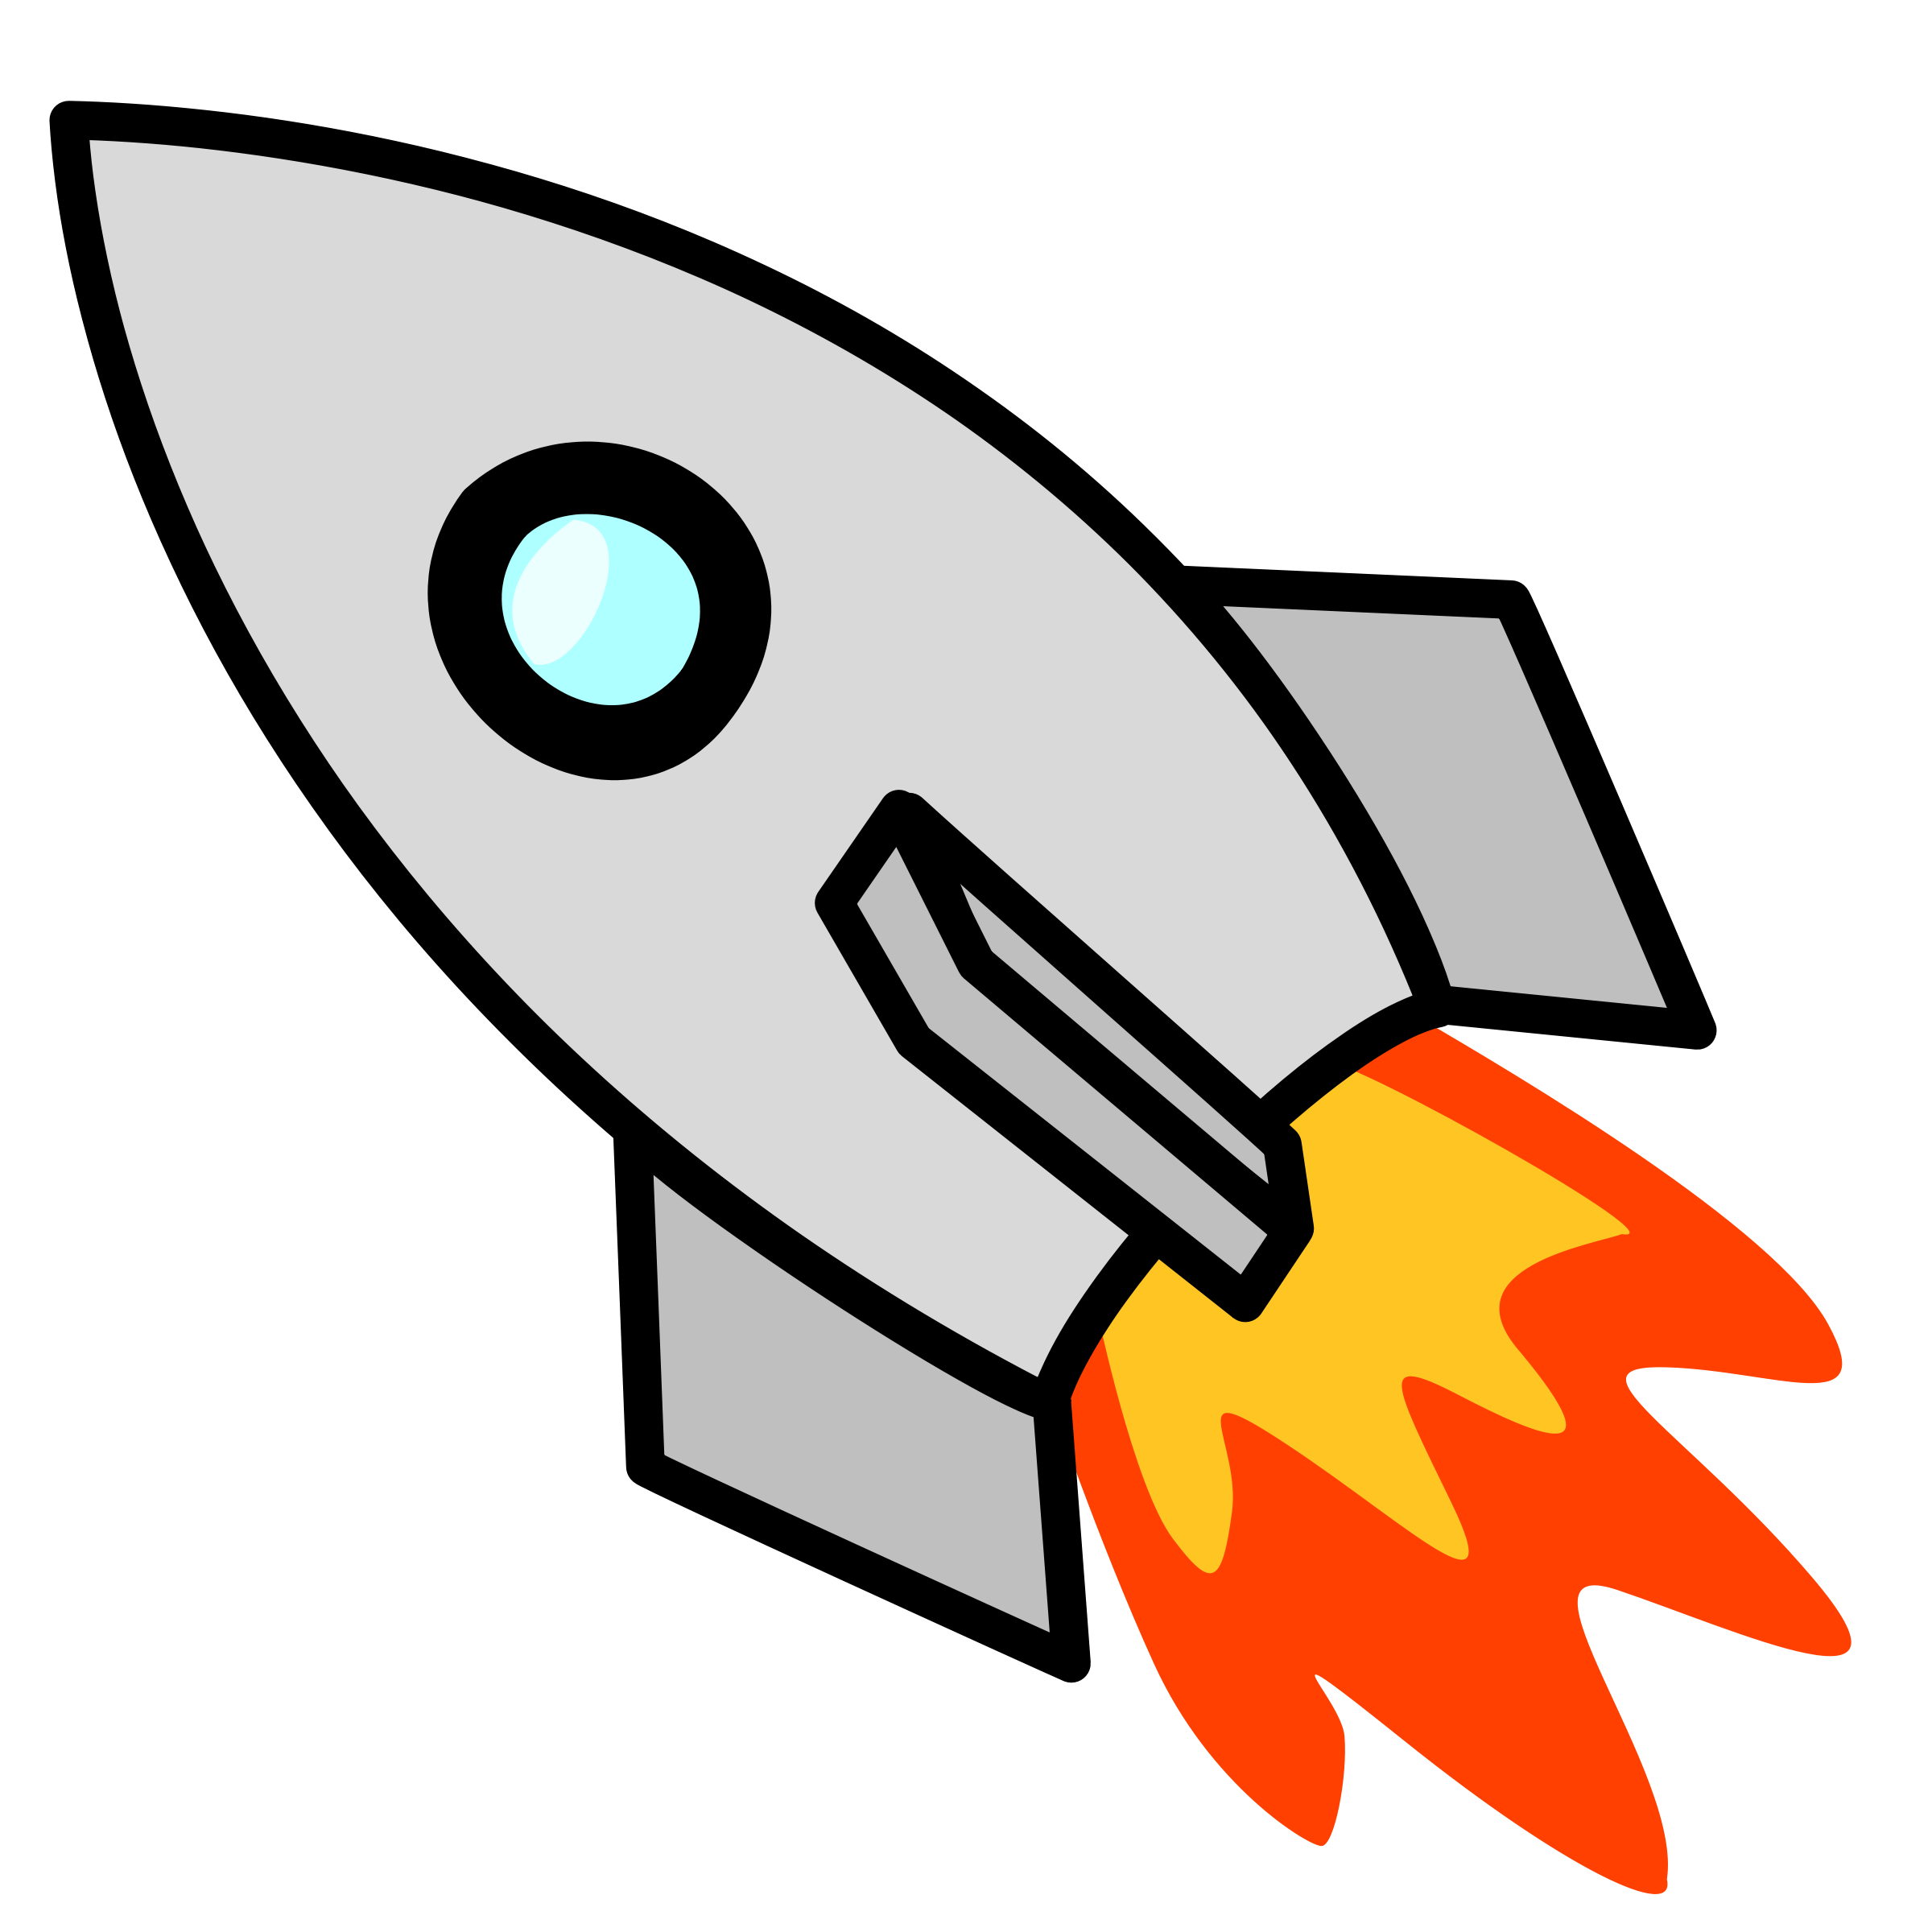 Rocket ship clipart images clip art free download 54+ Rocket Ship Clipart | ClipartLook clip art free download